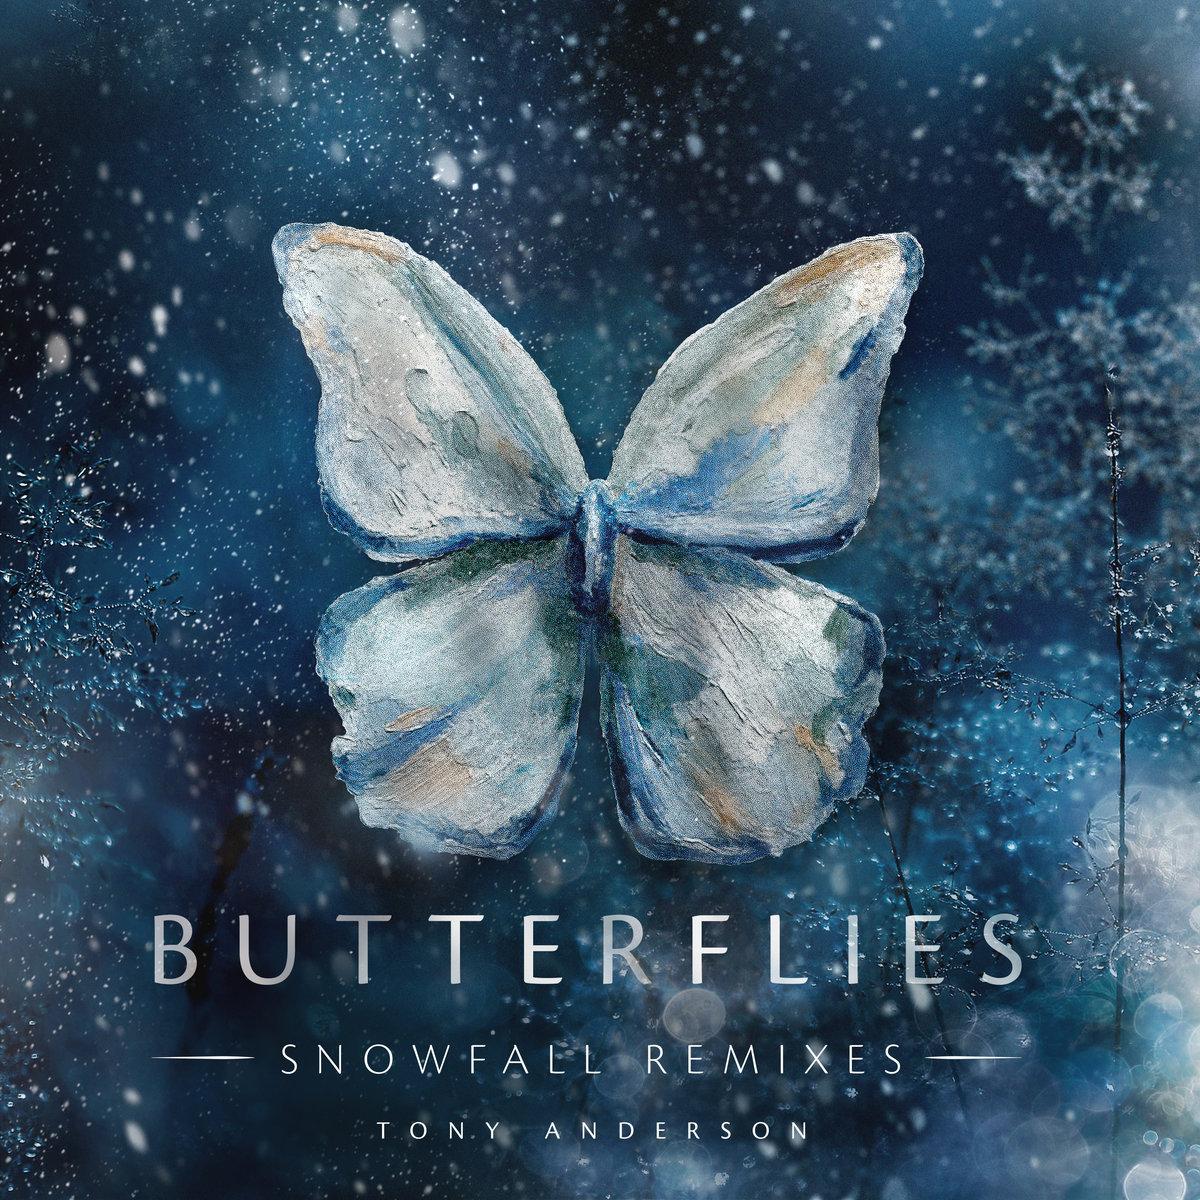 دانلود آلبوم موسیقی Butterflies توسط Tony Anderson